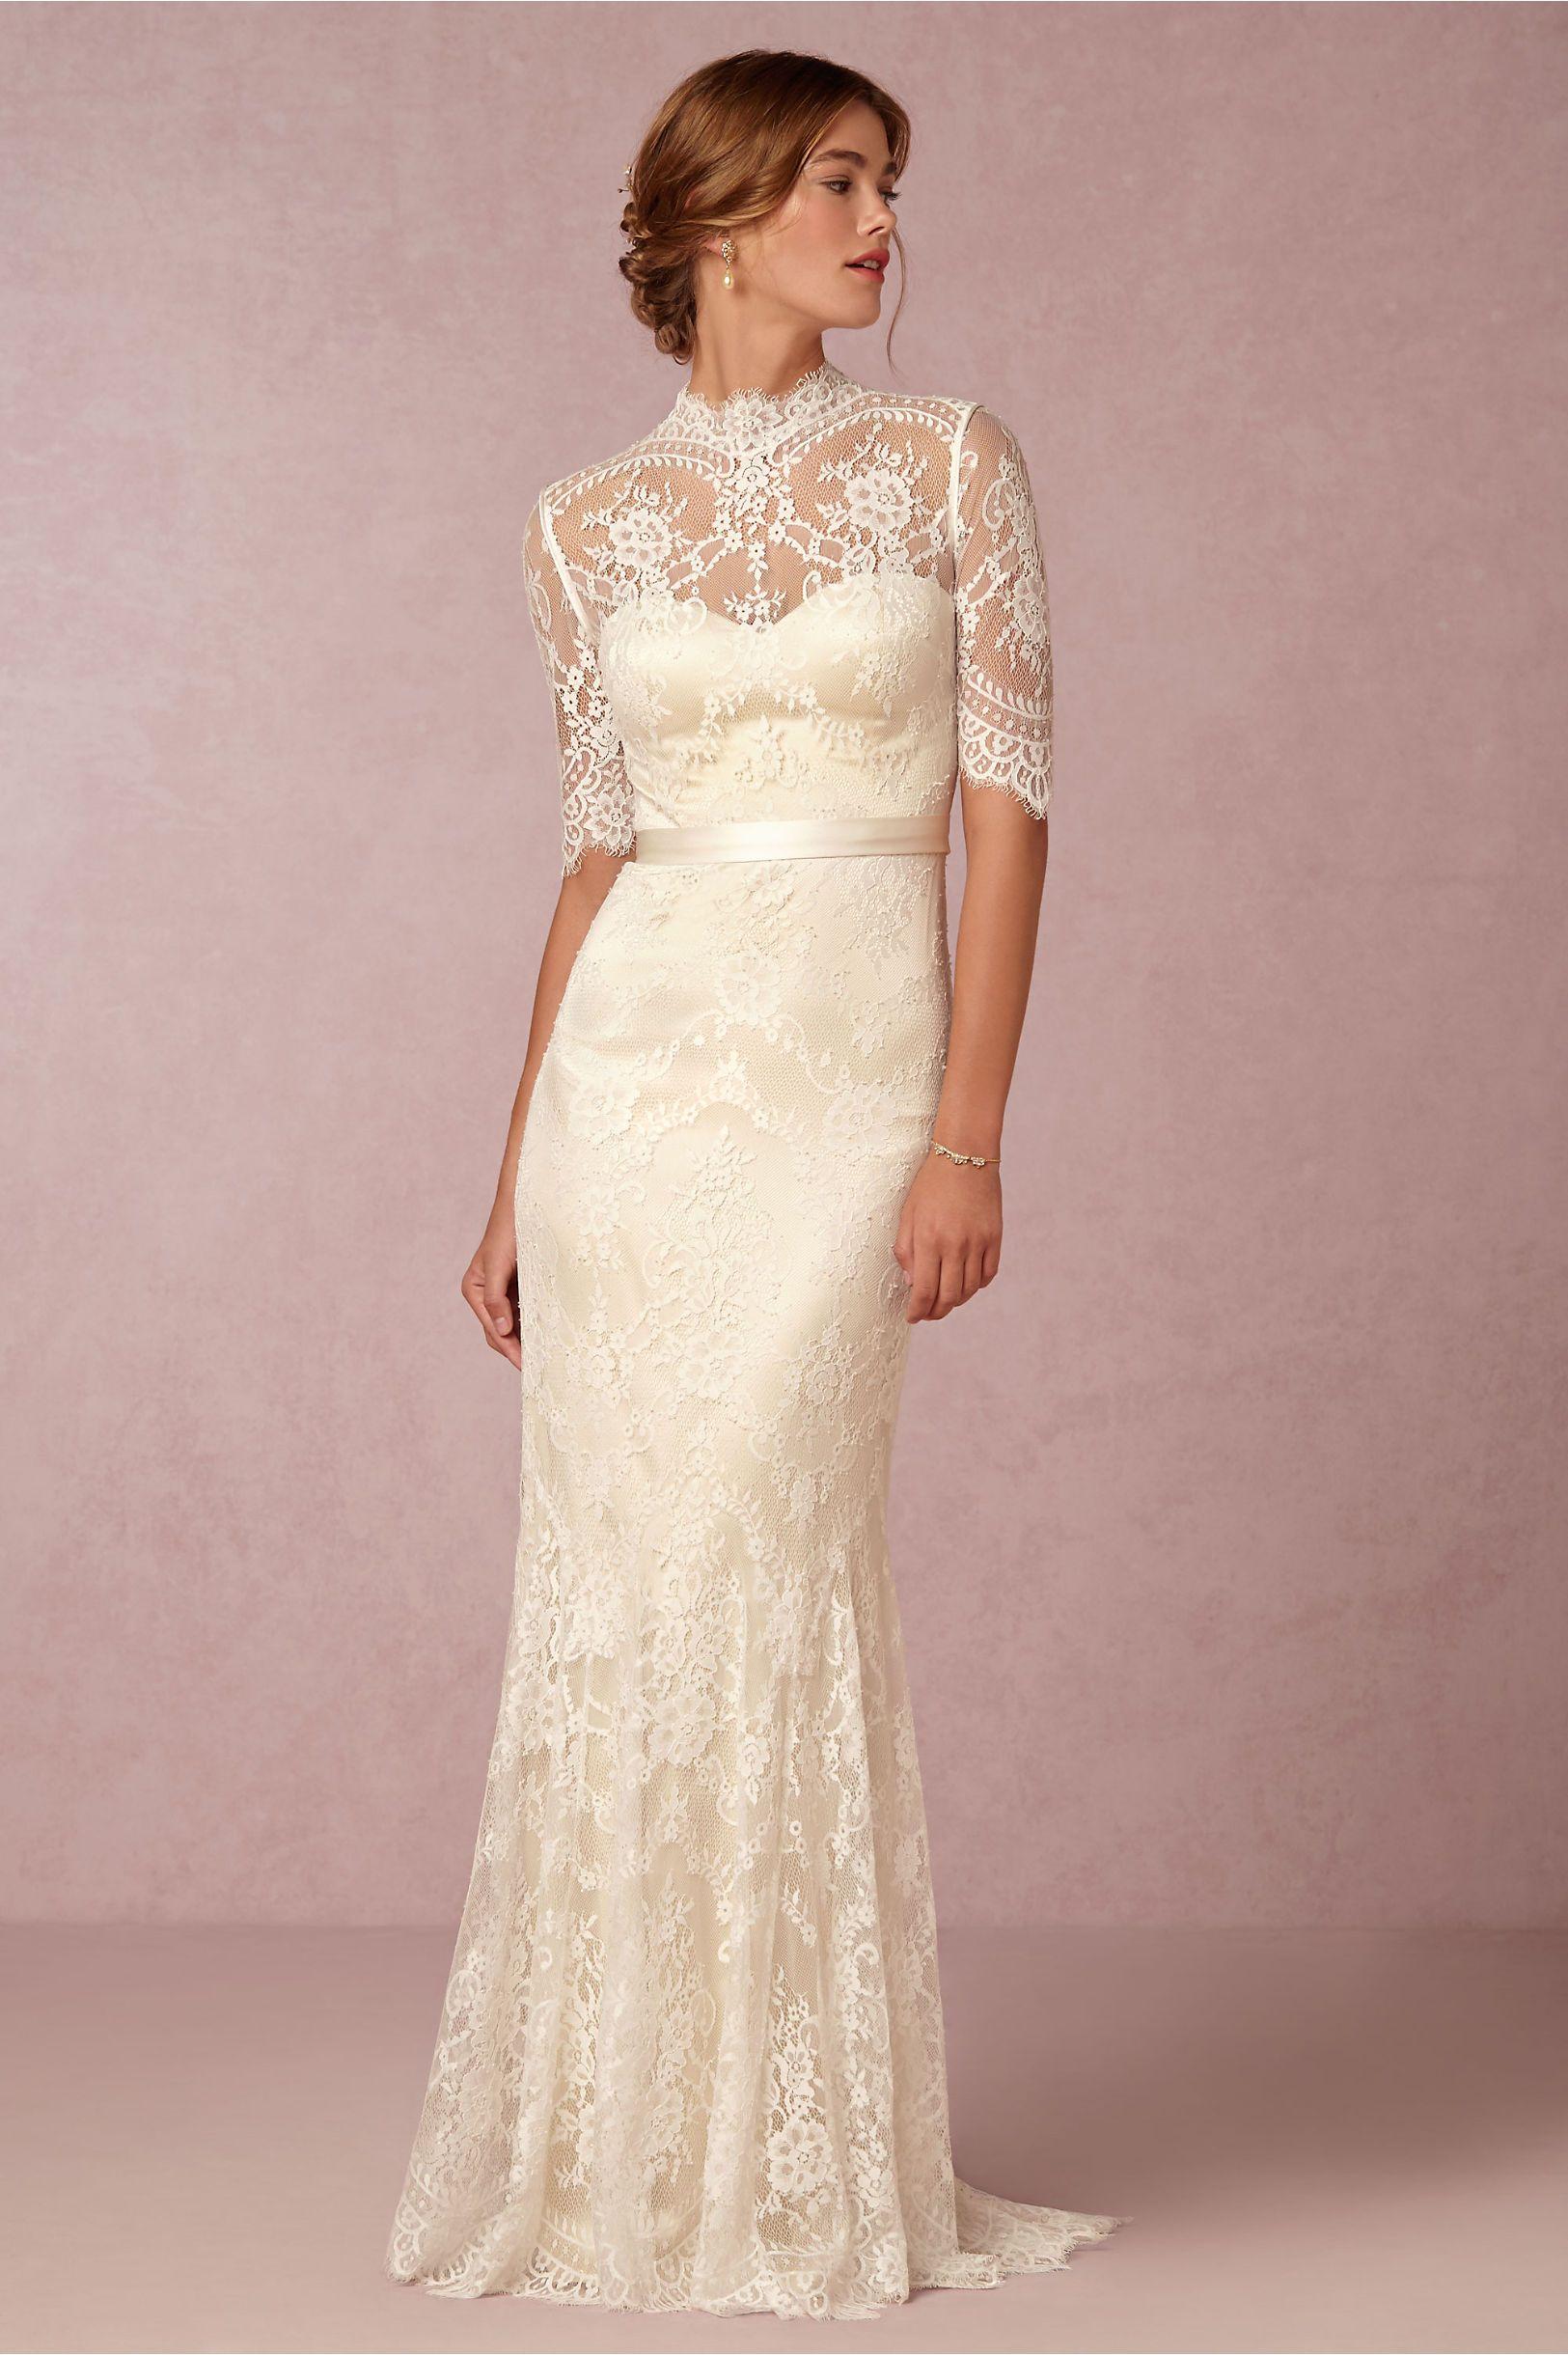 turtleneck wedding dress Bridgette STUNNING Cream Lace Column Sheath Wedding Gown Showcasing Half Lace Illusion